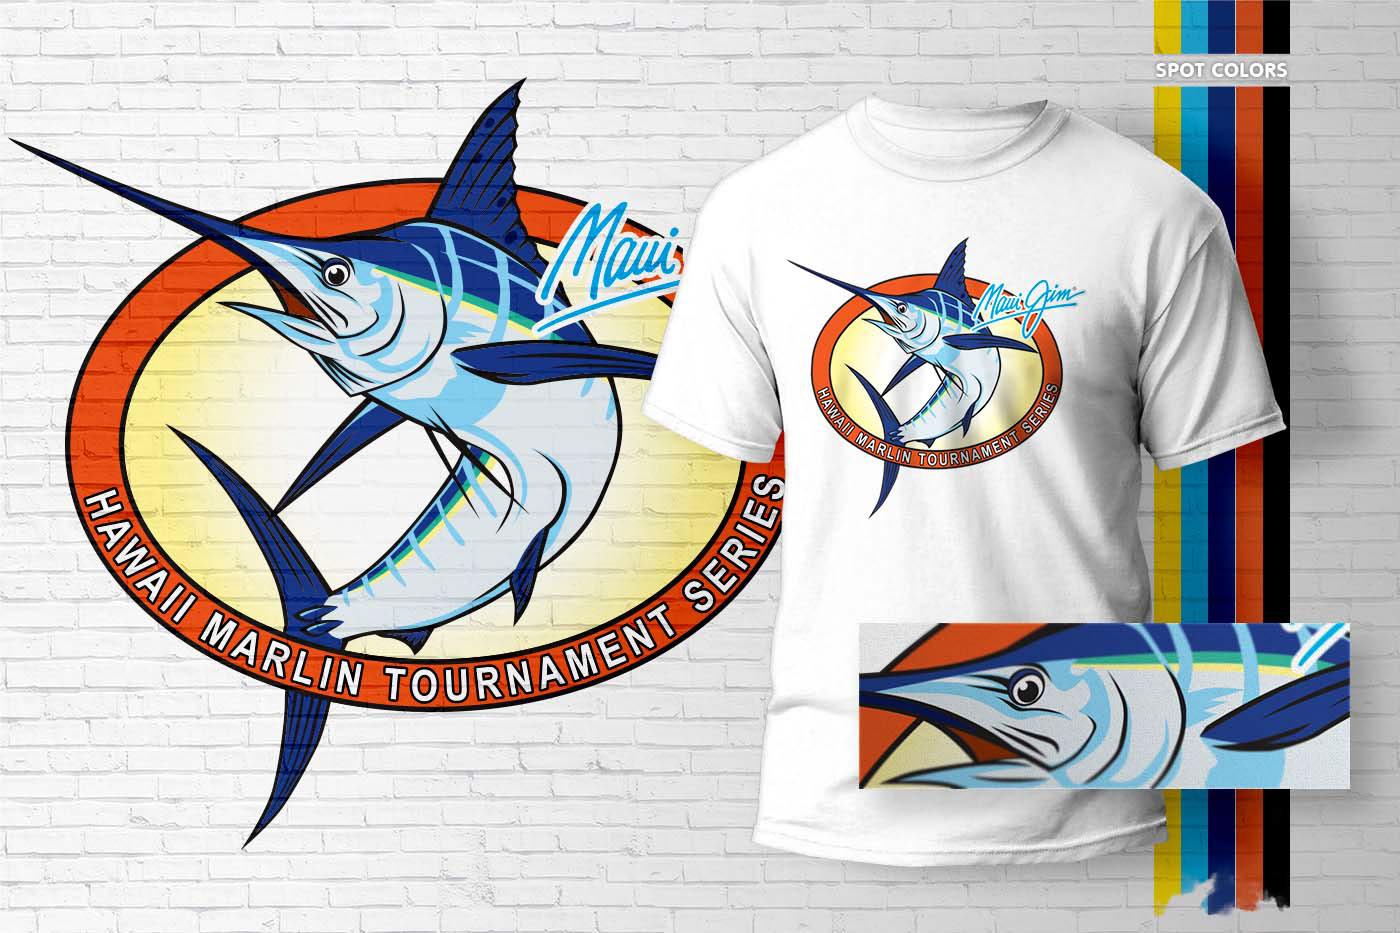 artist artwork Character design  design Digital Art  Drawing  ILLUSTRATION  logo t-shirt vector